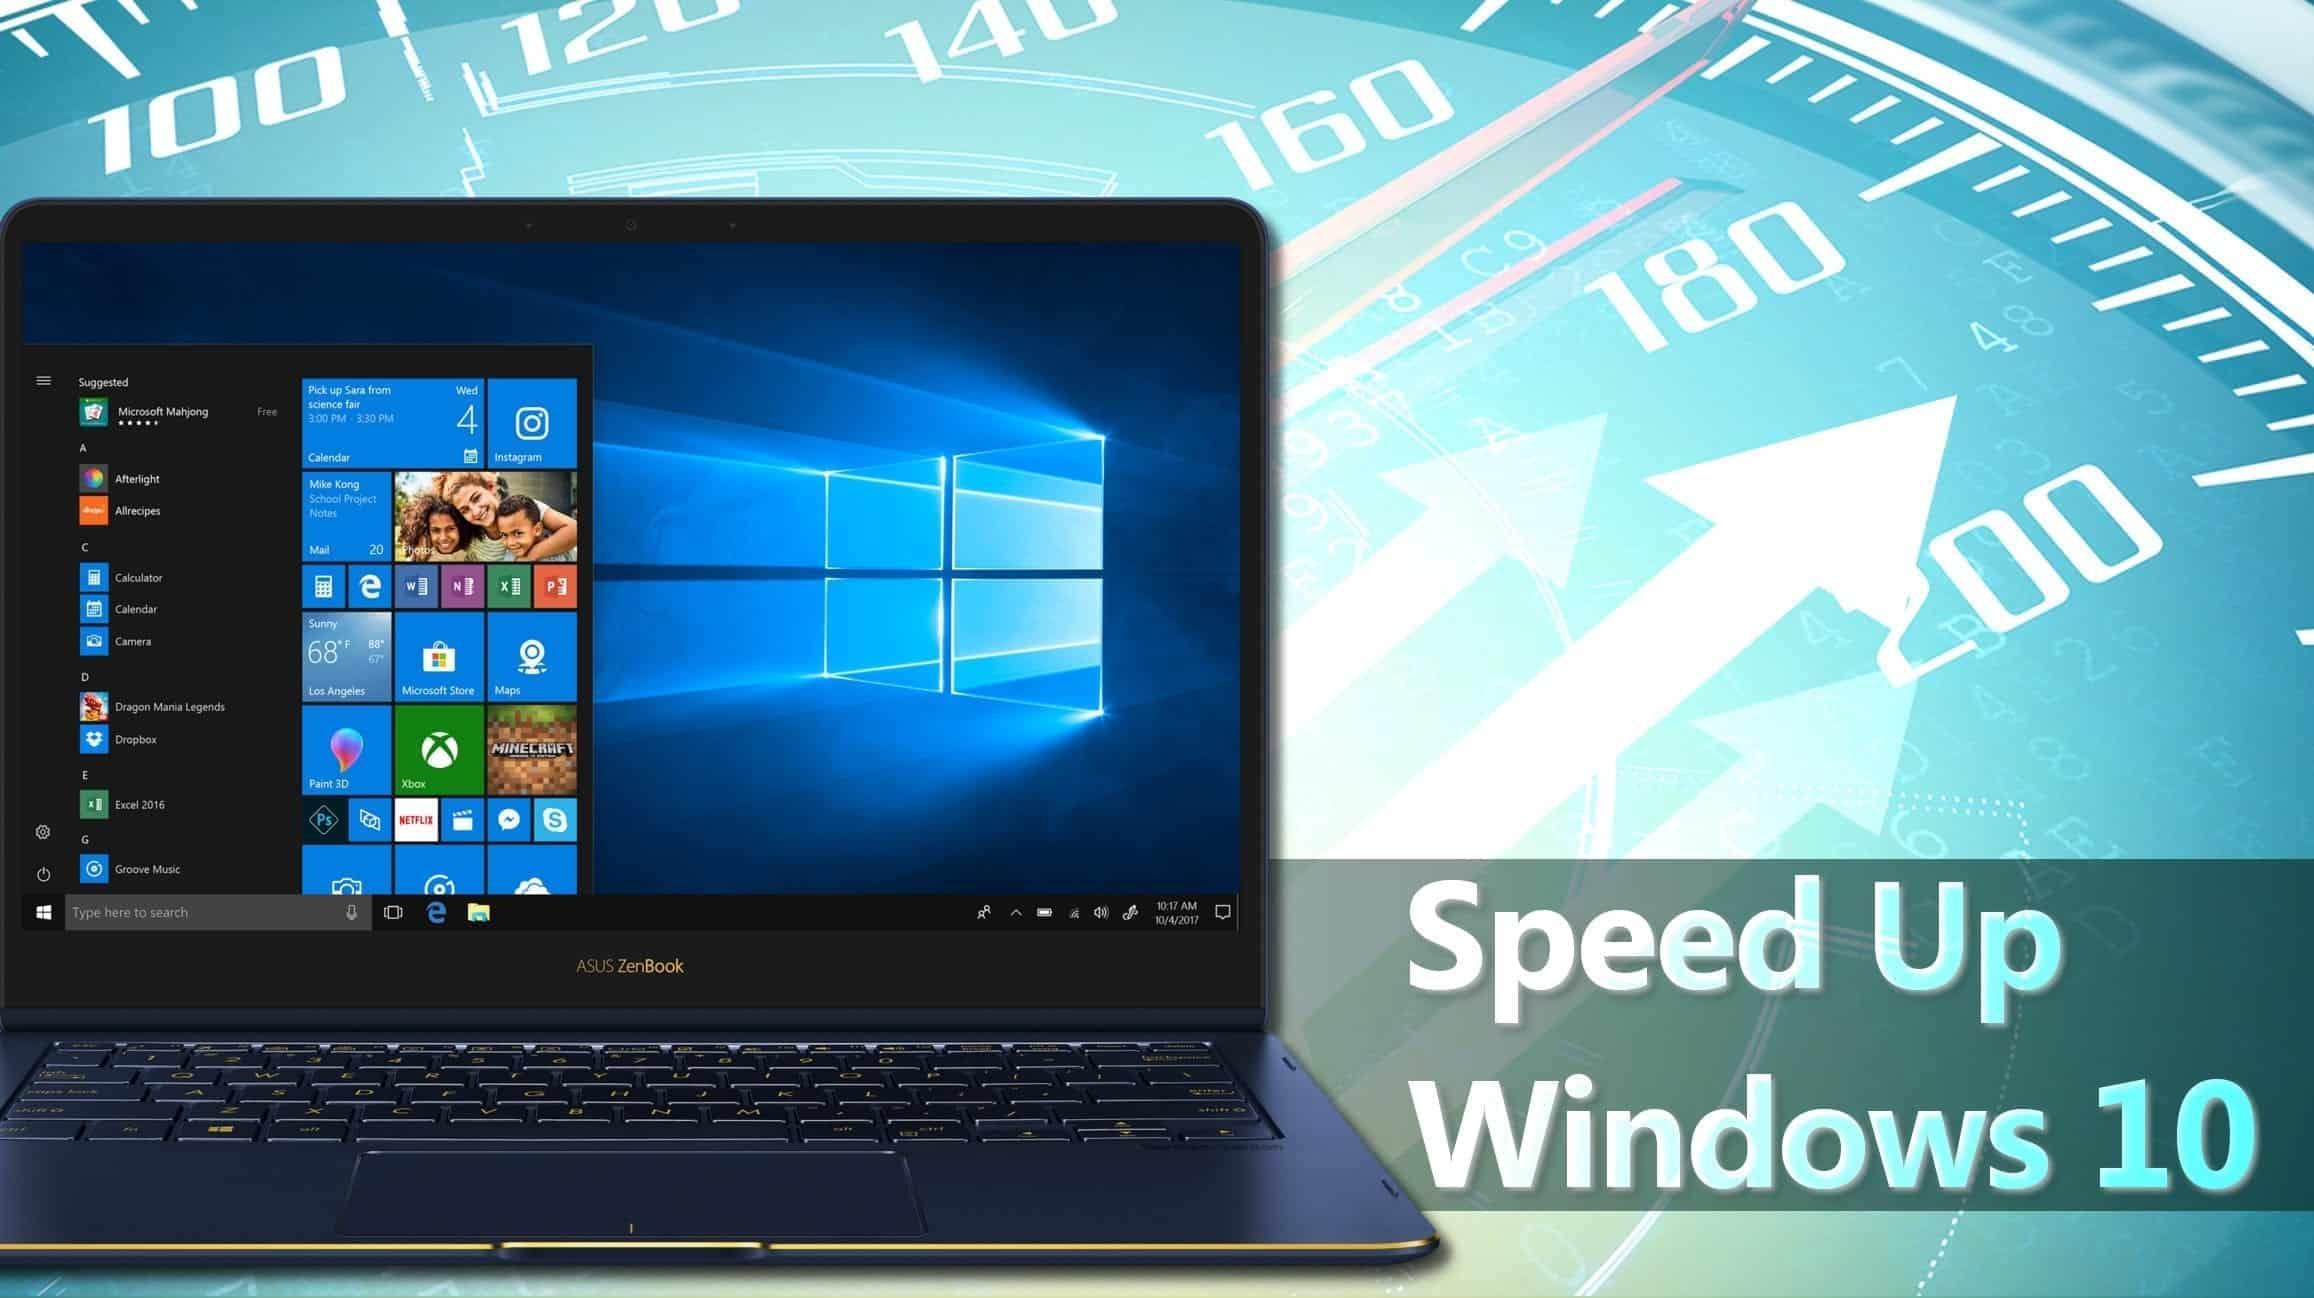 10 Easy ways to speed up windows 10